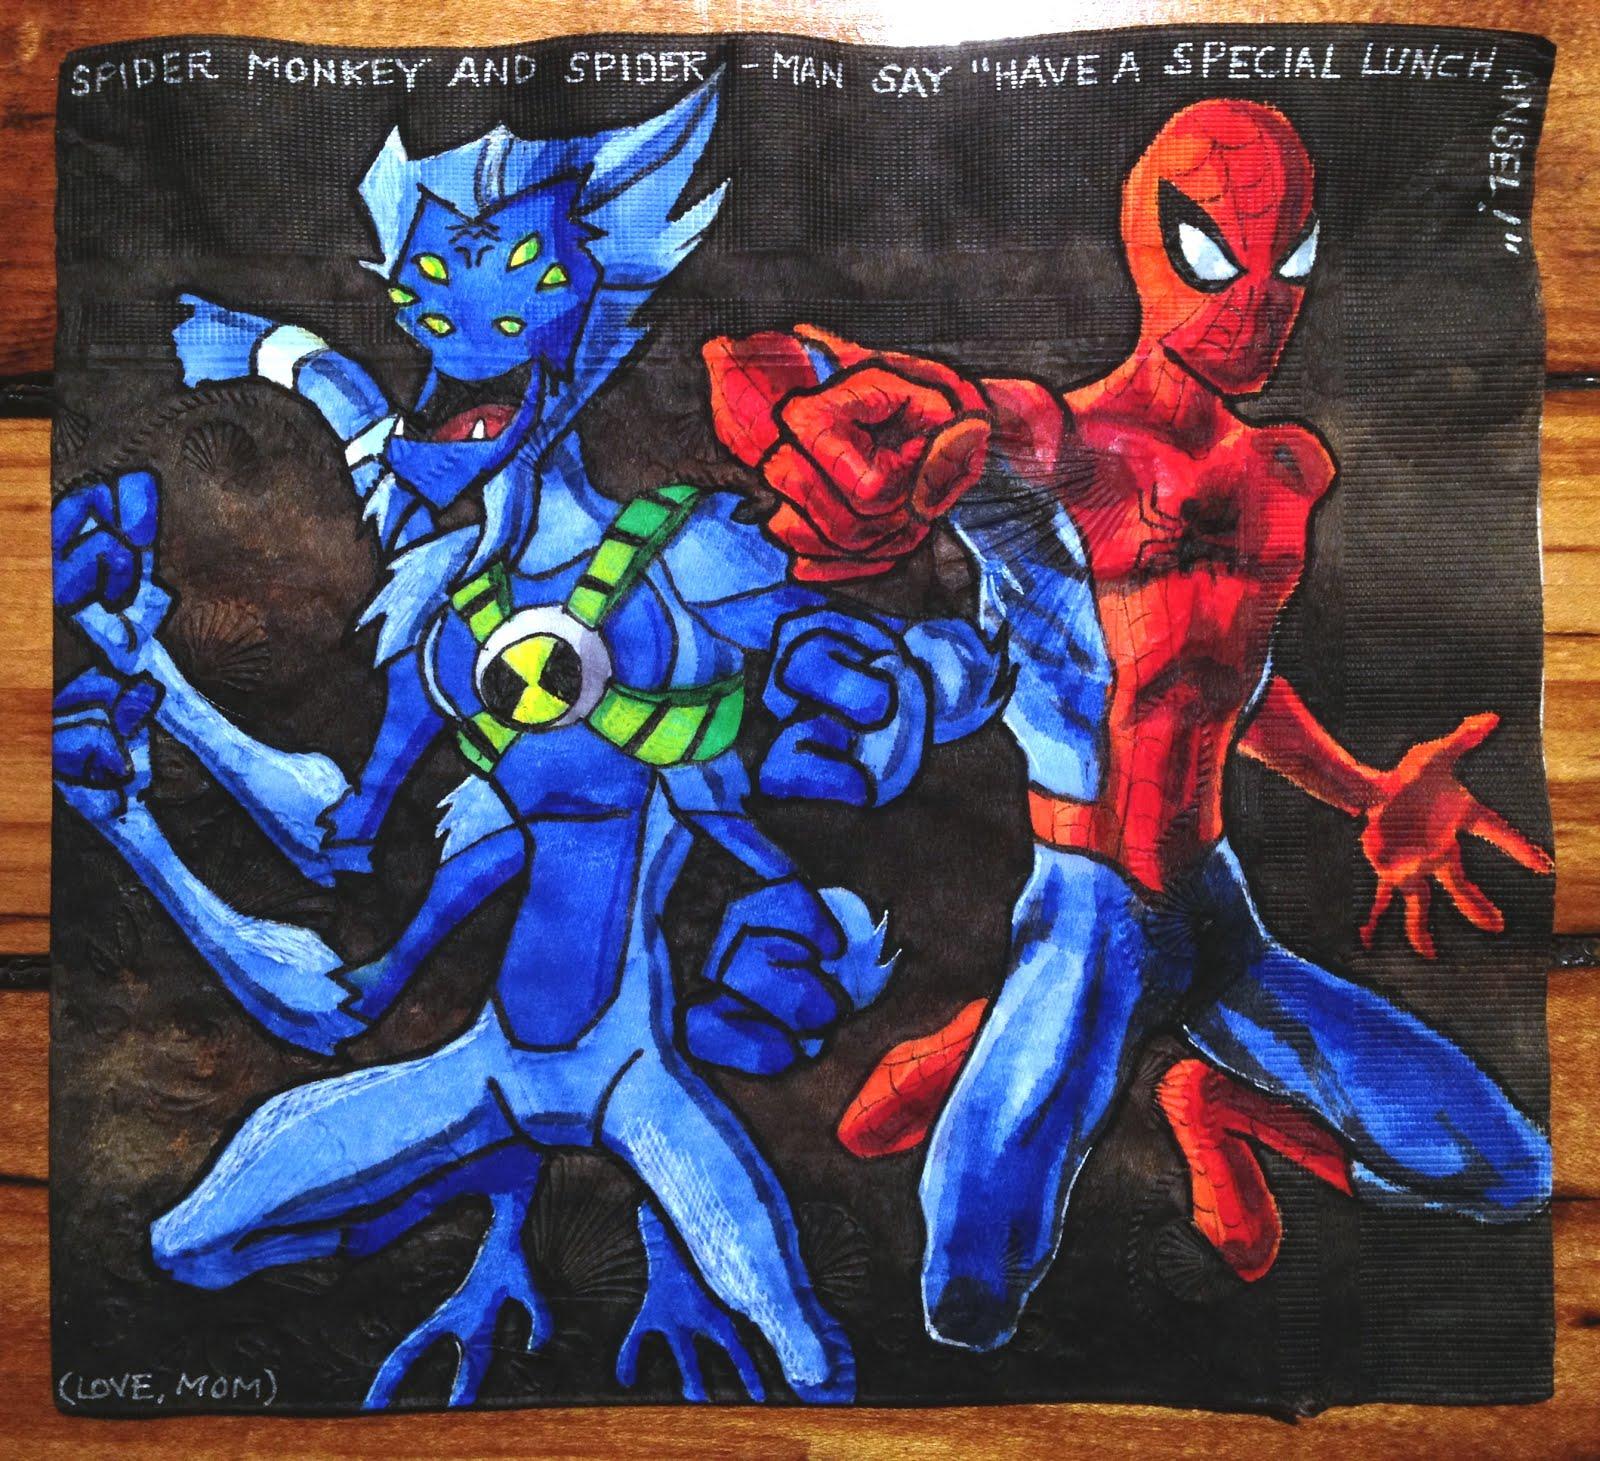 Daily Napkins: Spidermonkey & Spider-Man